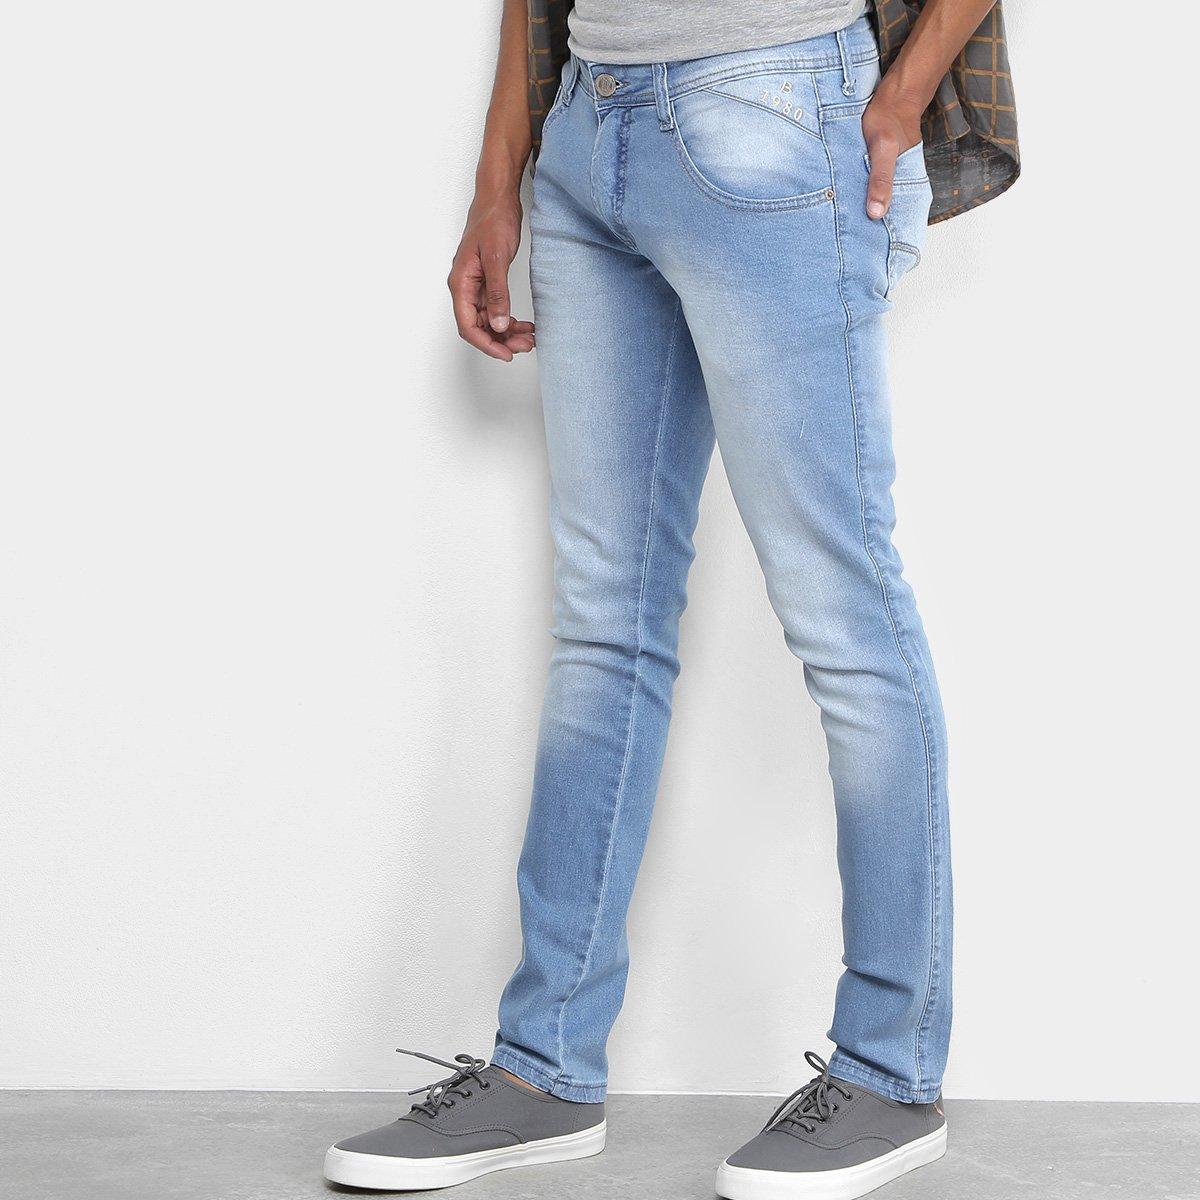 6c2c800b5 Calça Jeans Skinny Biotipo Lavagem Clara Estonada Masculina - Tam: 44 - ...